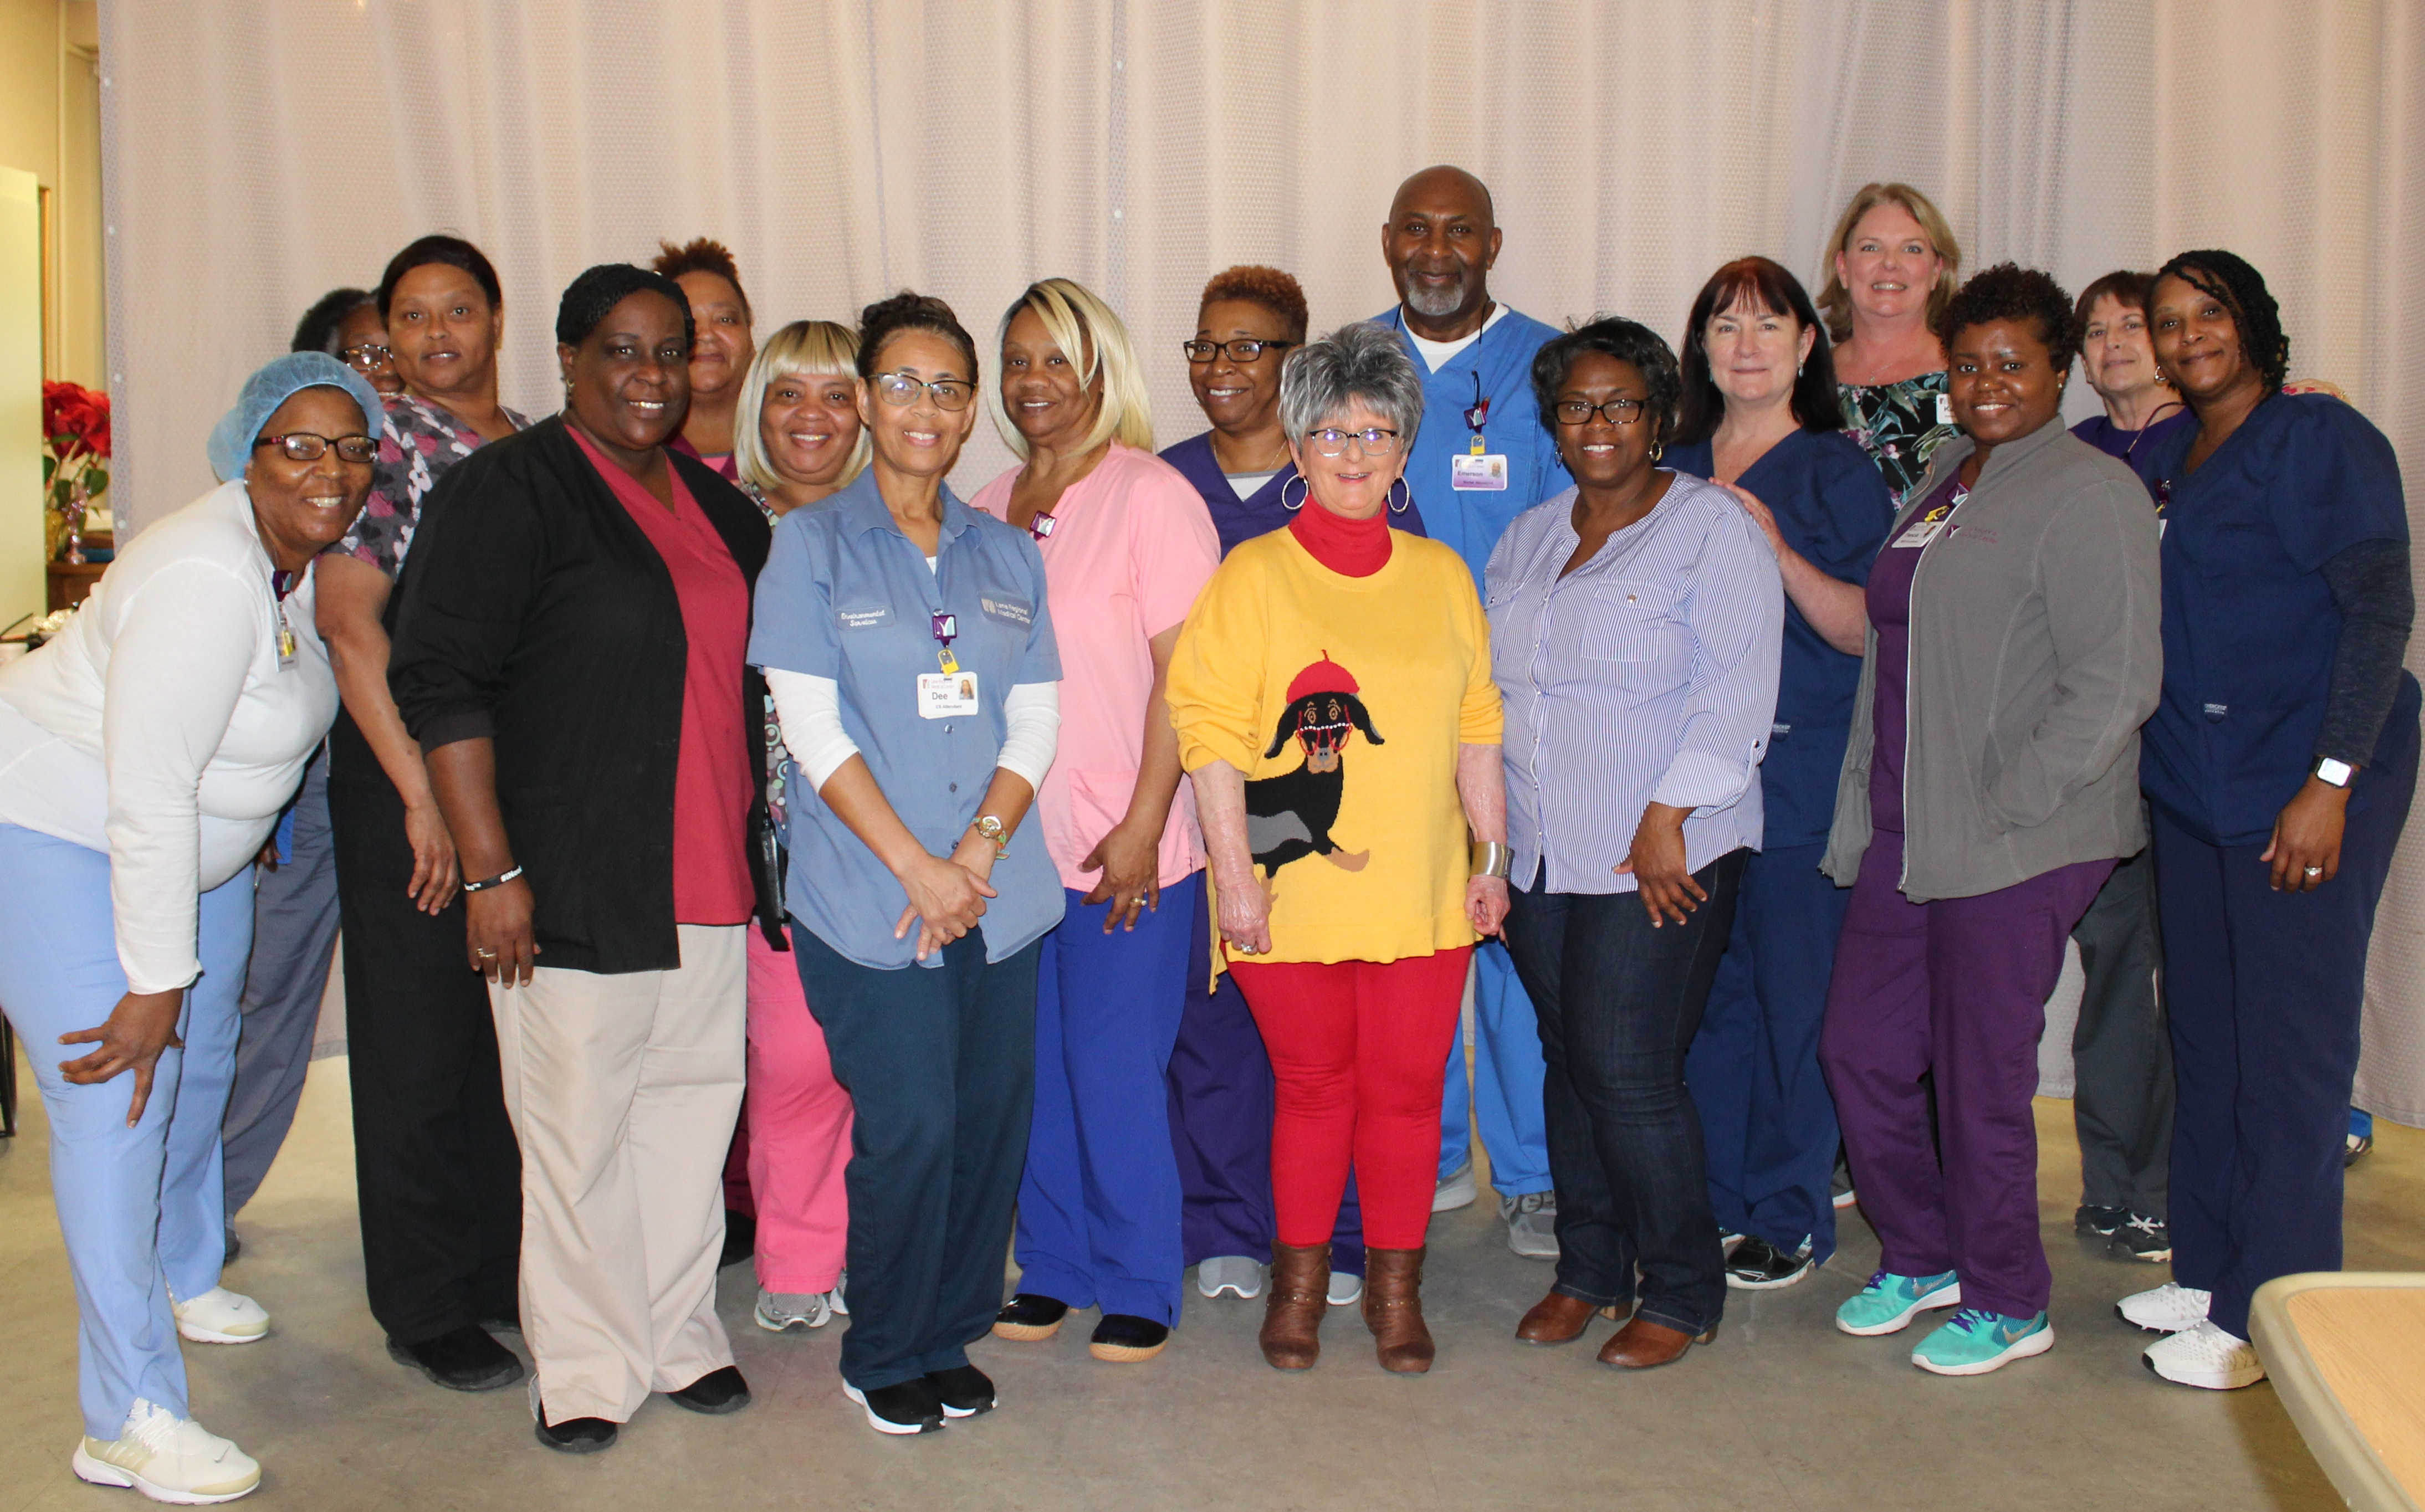 Lane Nursing Home Awarded 5-Star Quality Rating